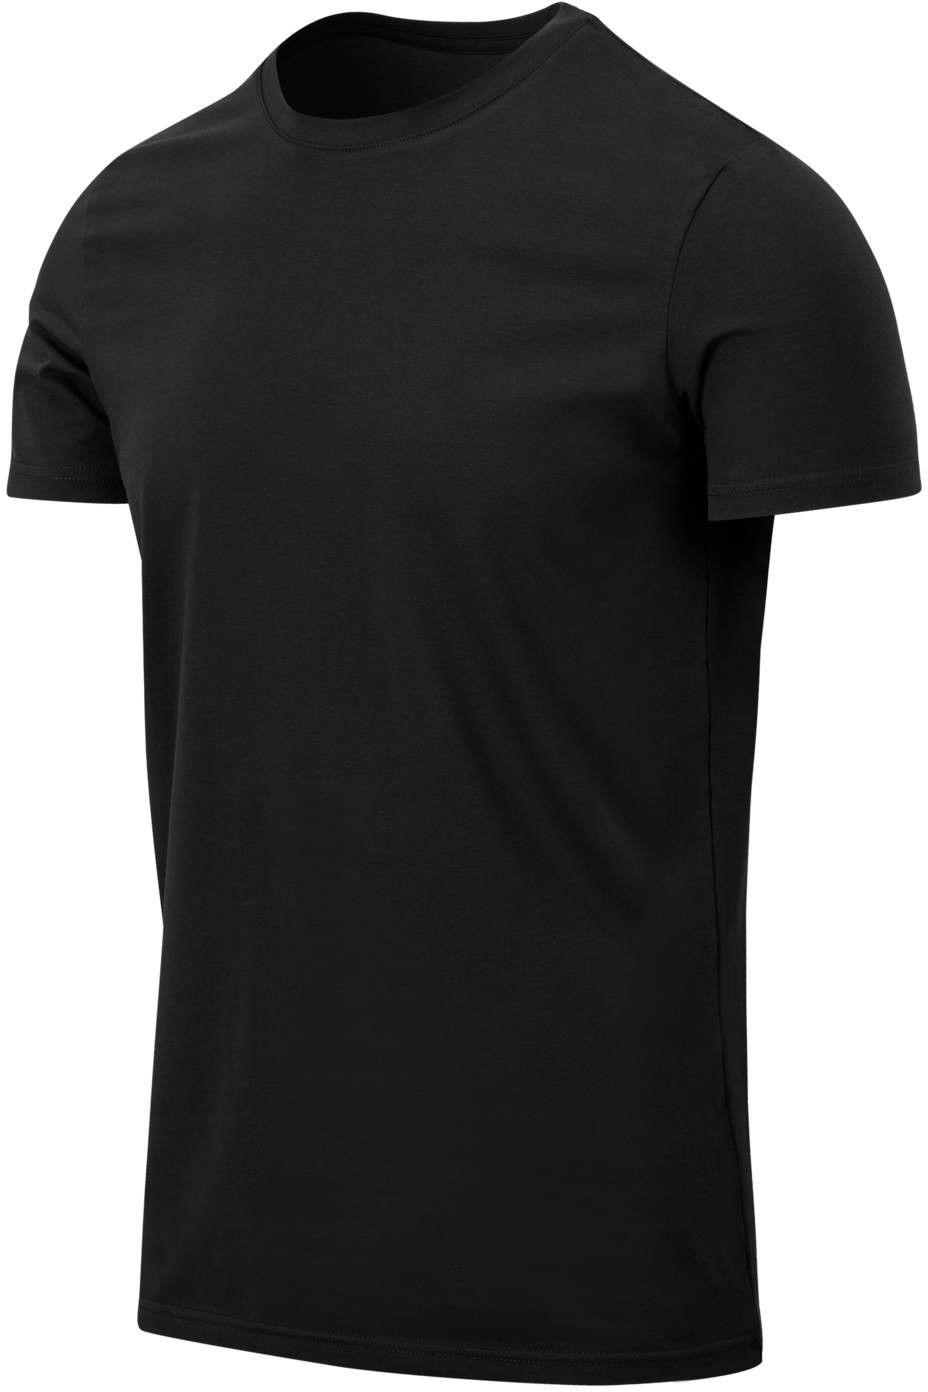 Koszulka T-Shirt Helikon Slim Czarny (TS-TSS-CC-01) H